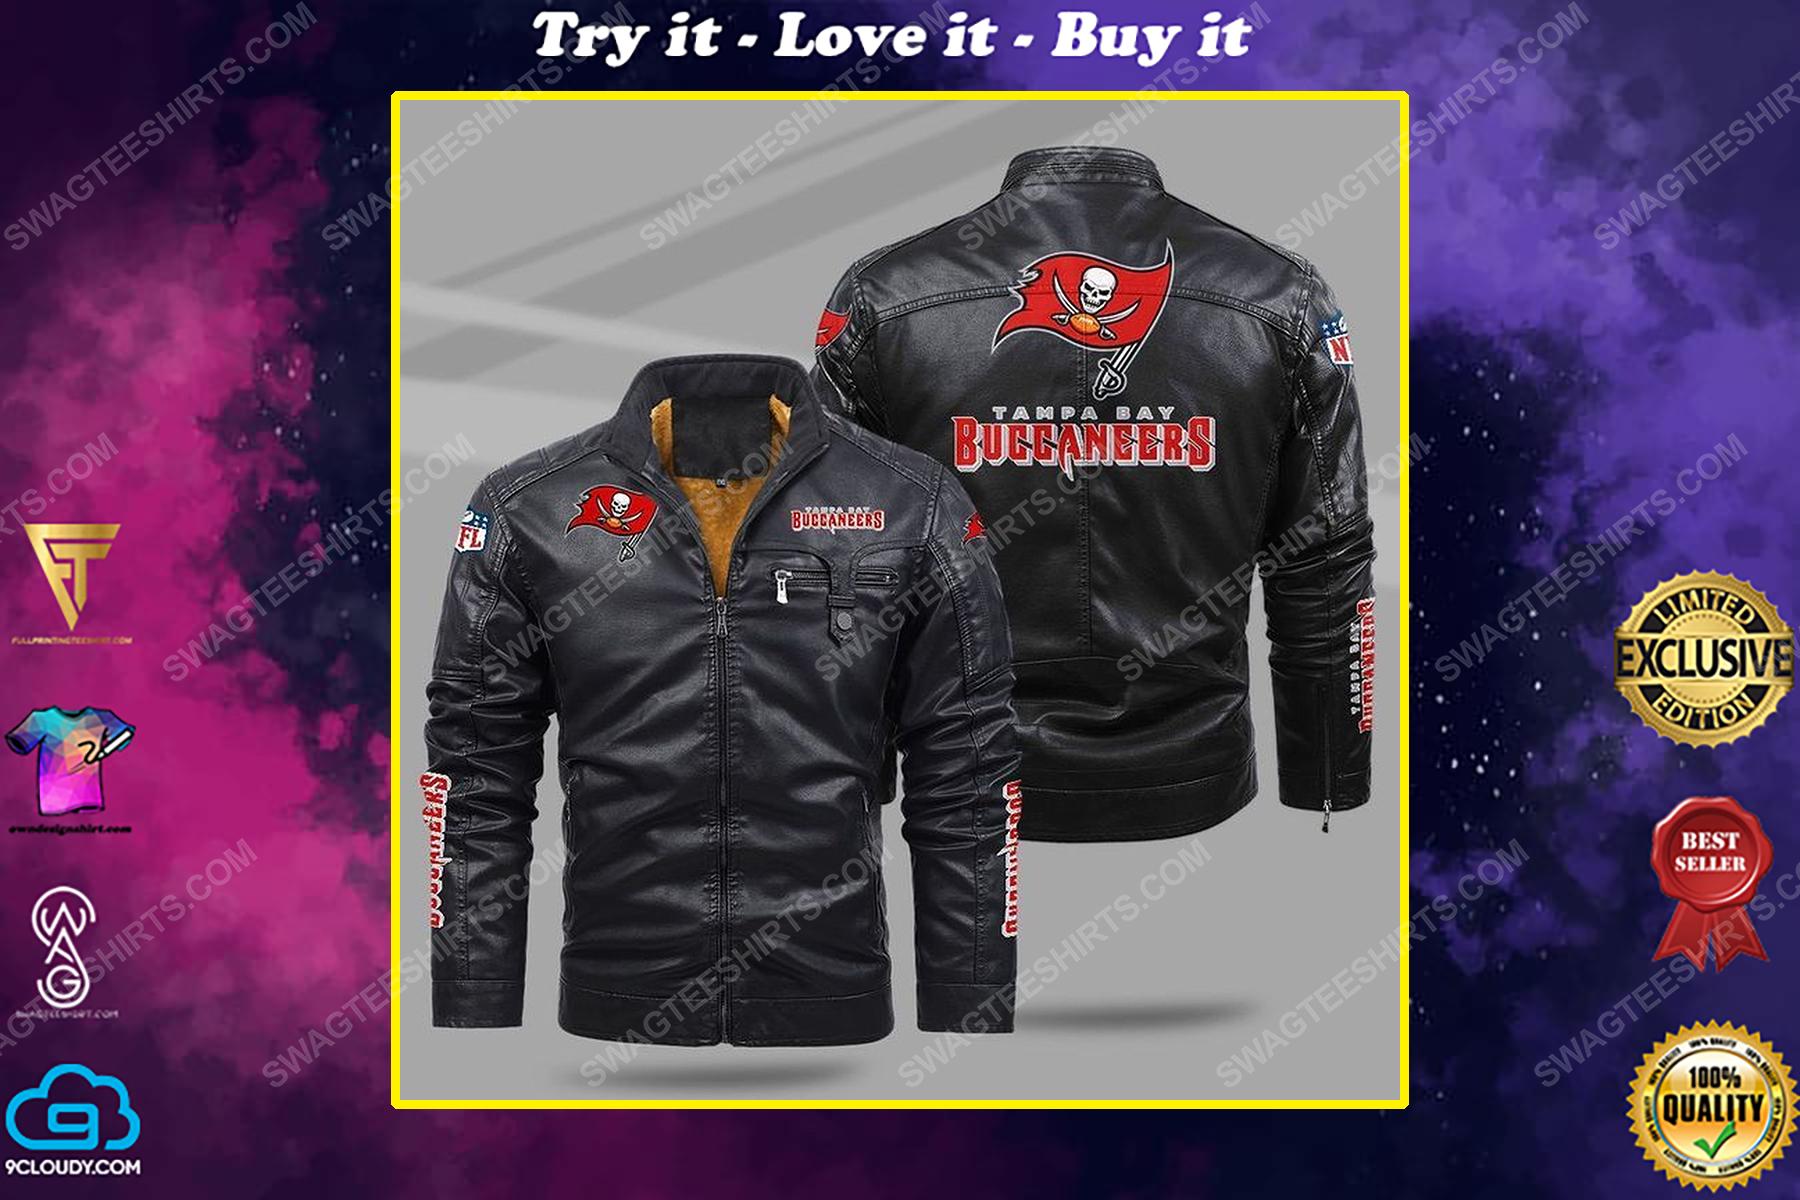 The tampa bay buccaneers nfl all over print fleece leather jacket